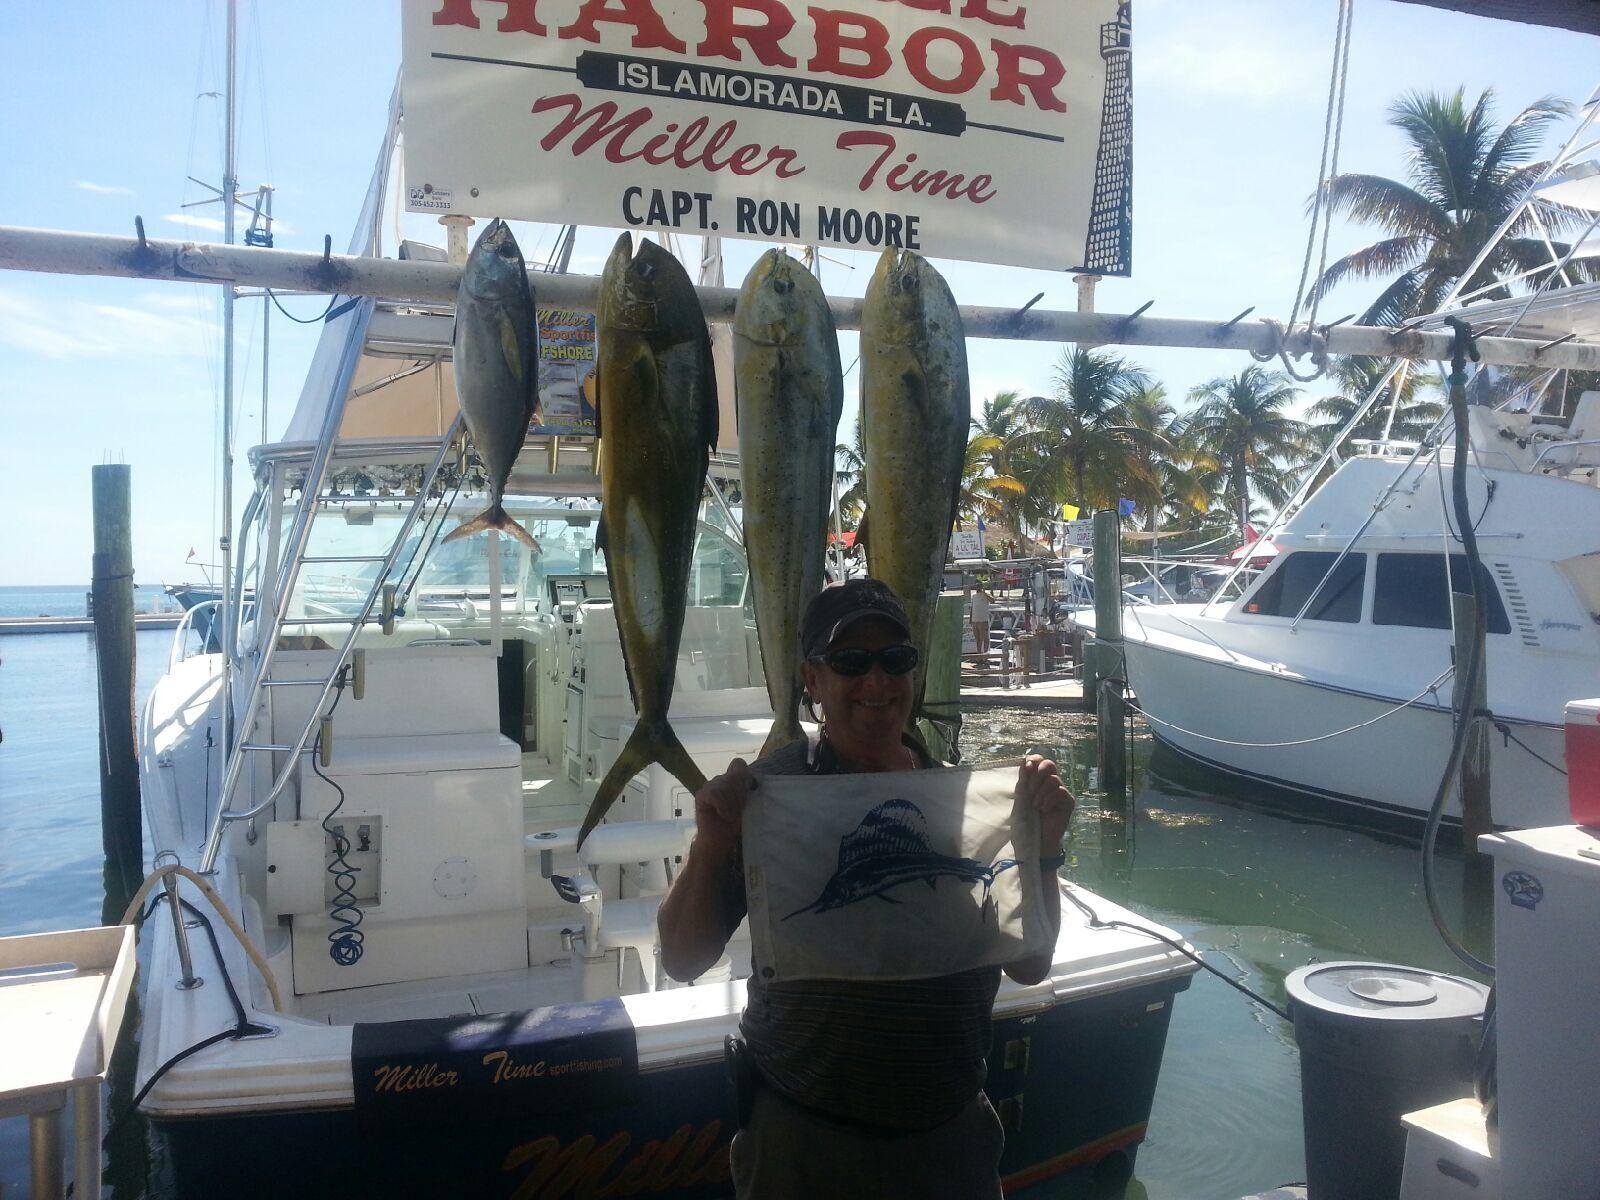 Miller Time Sportfishing: Example Full Day Trip